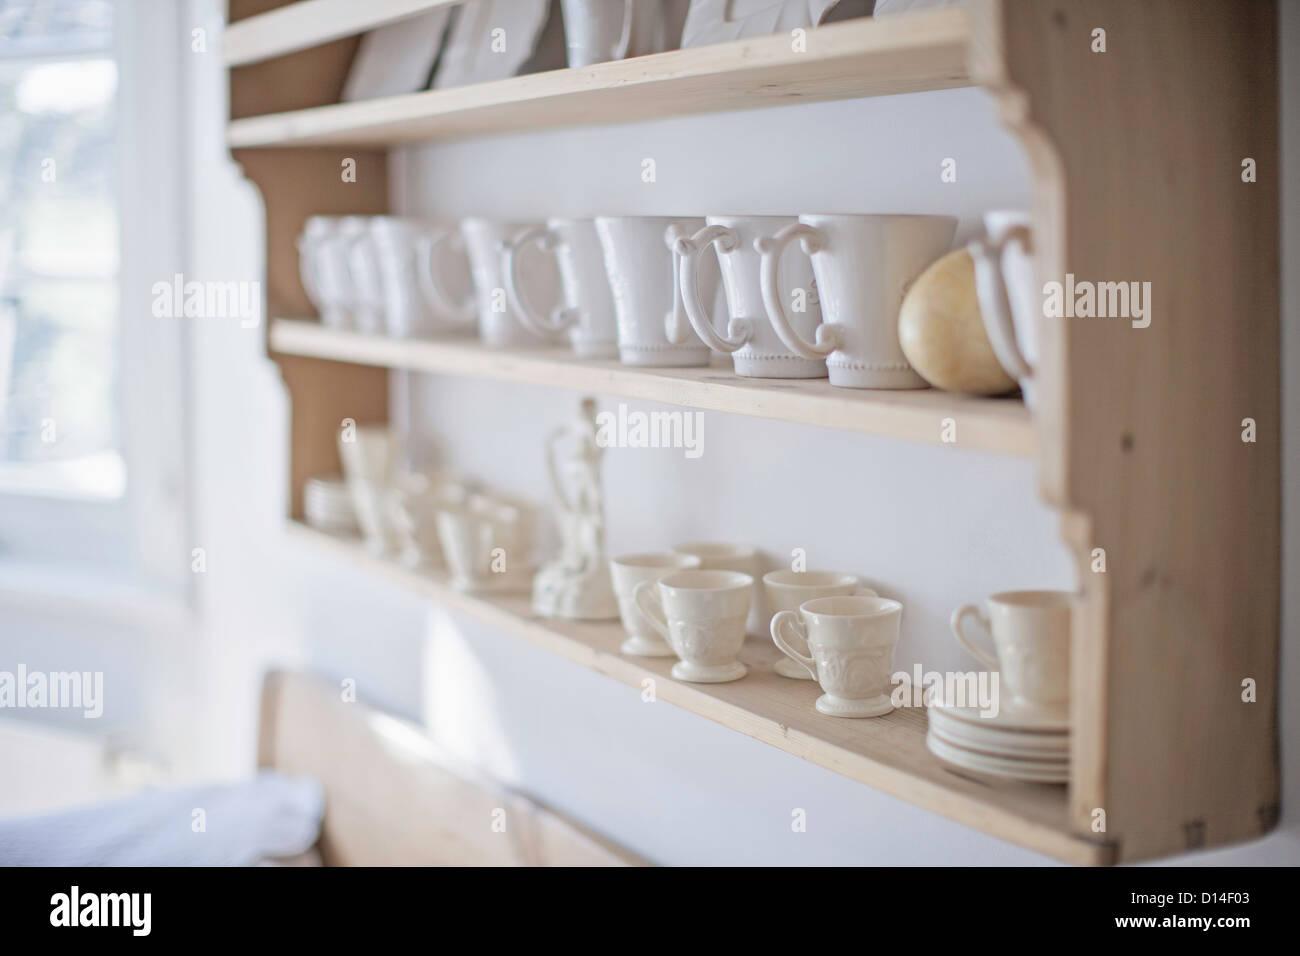 Milchkaffee Tassen Auf Kuchenregal Stockfoto Bild 52345331 Alamy